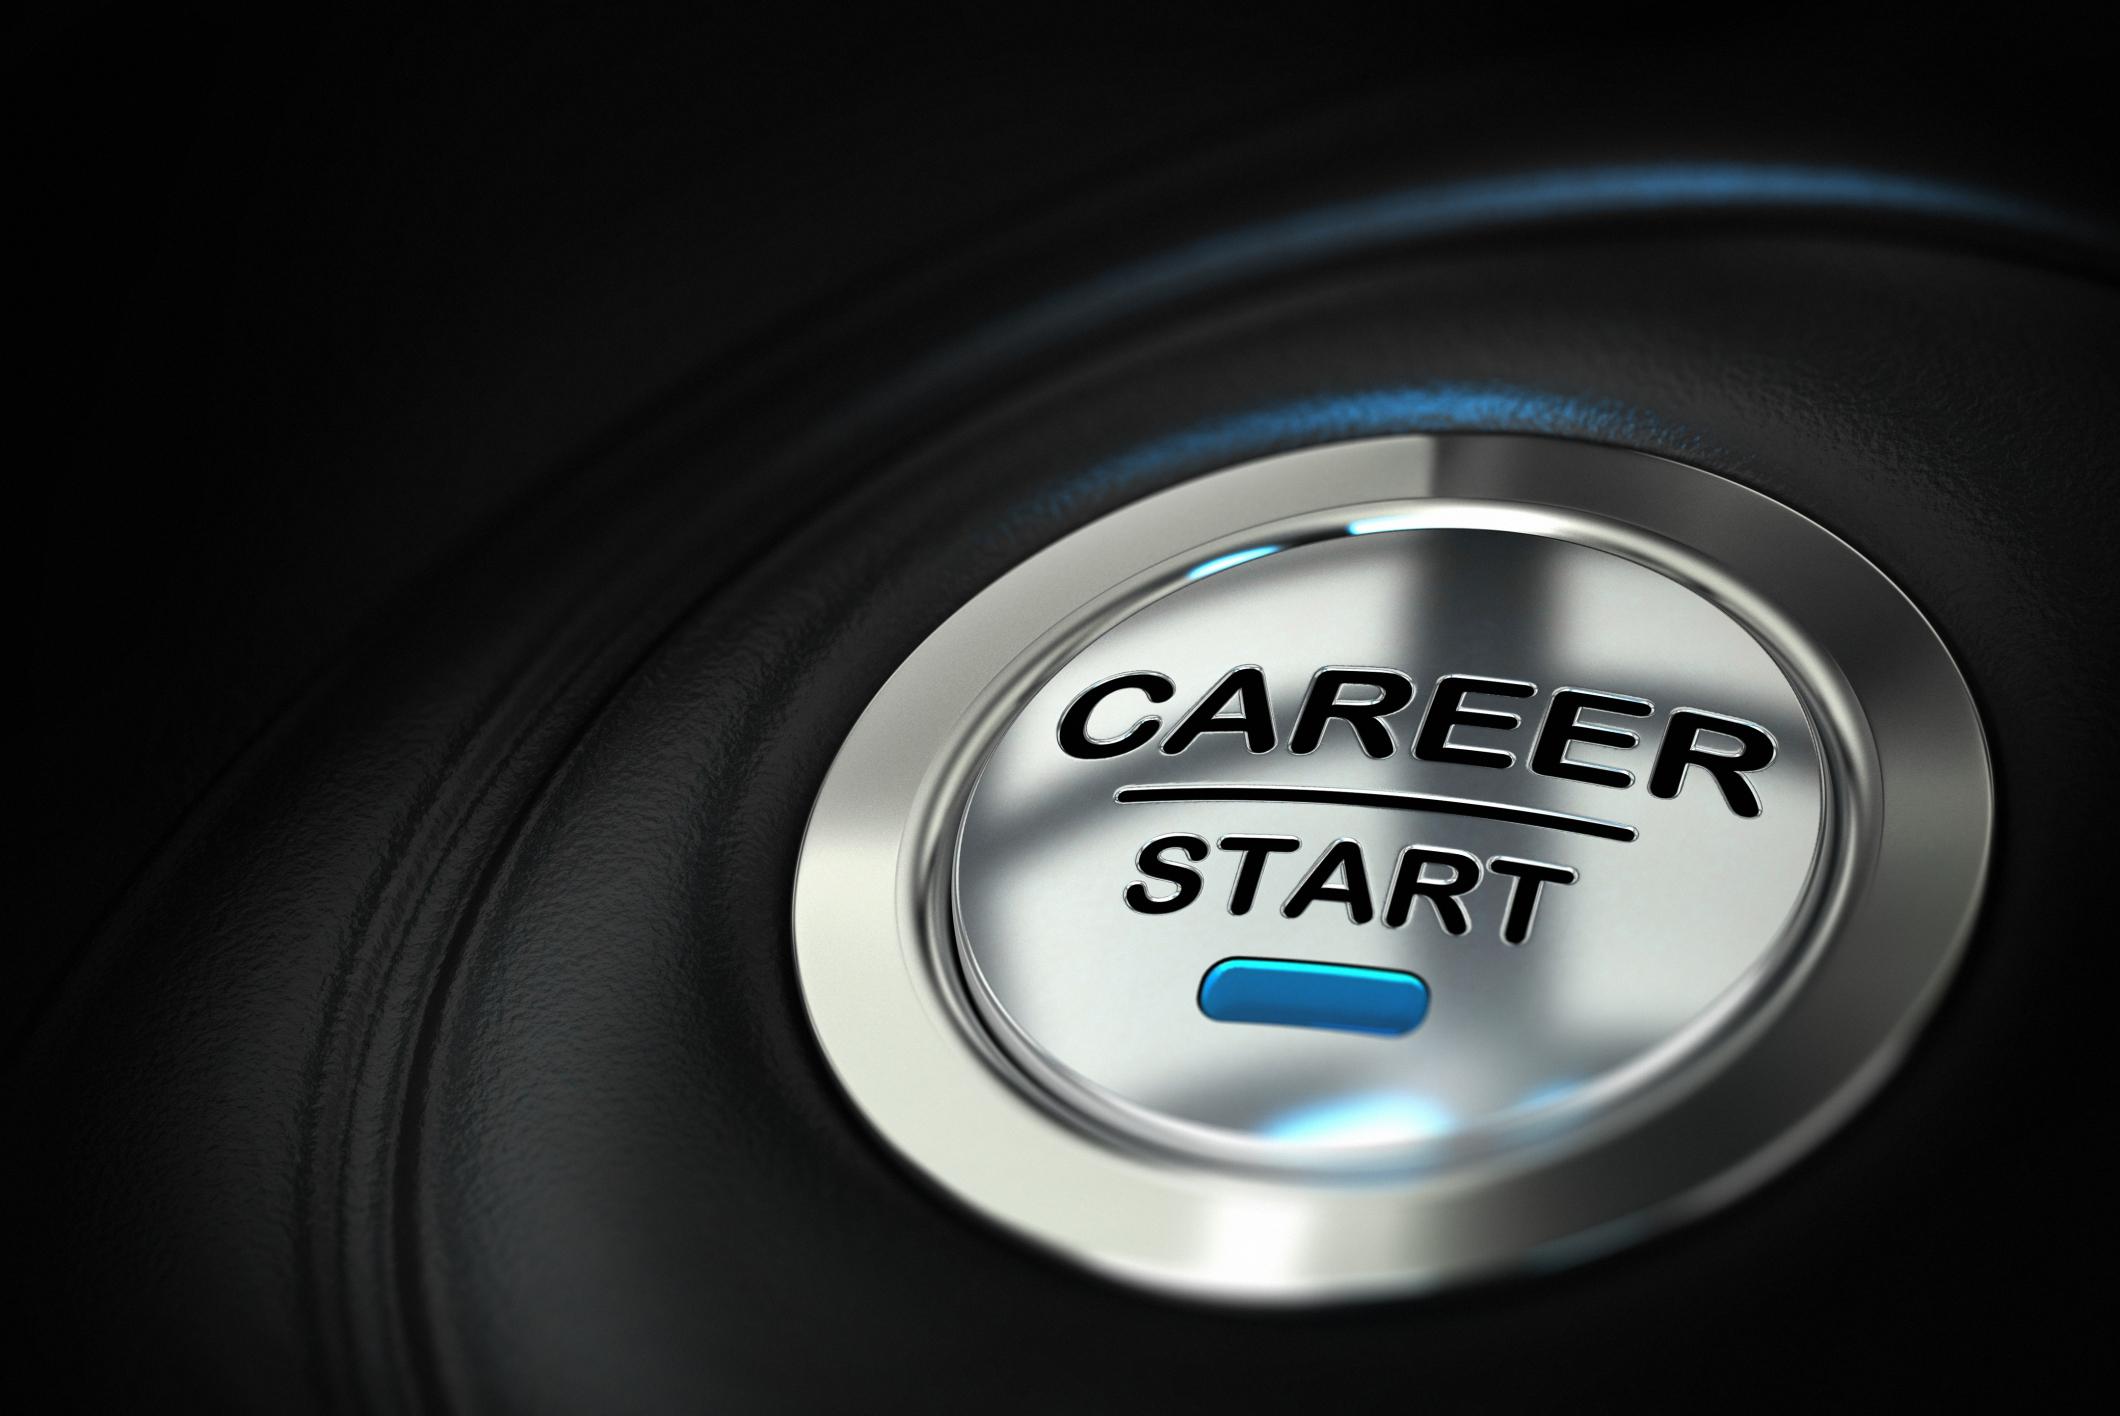 should i change careers